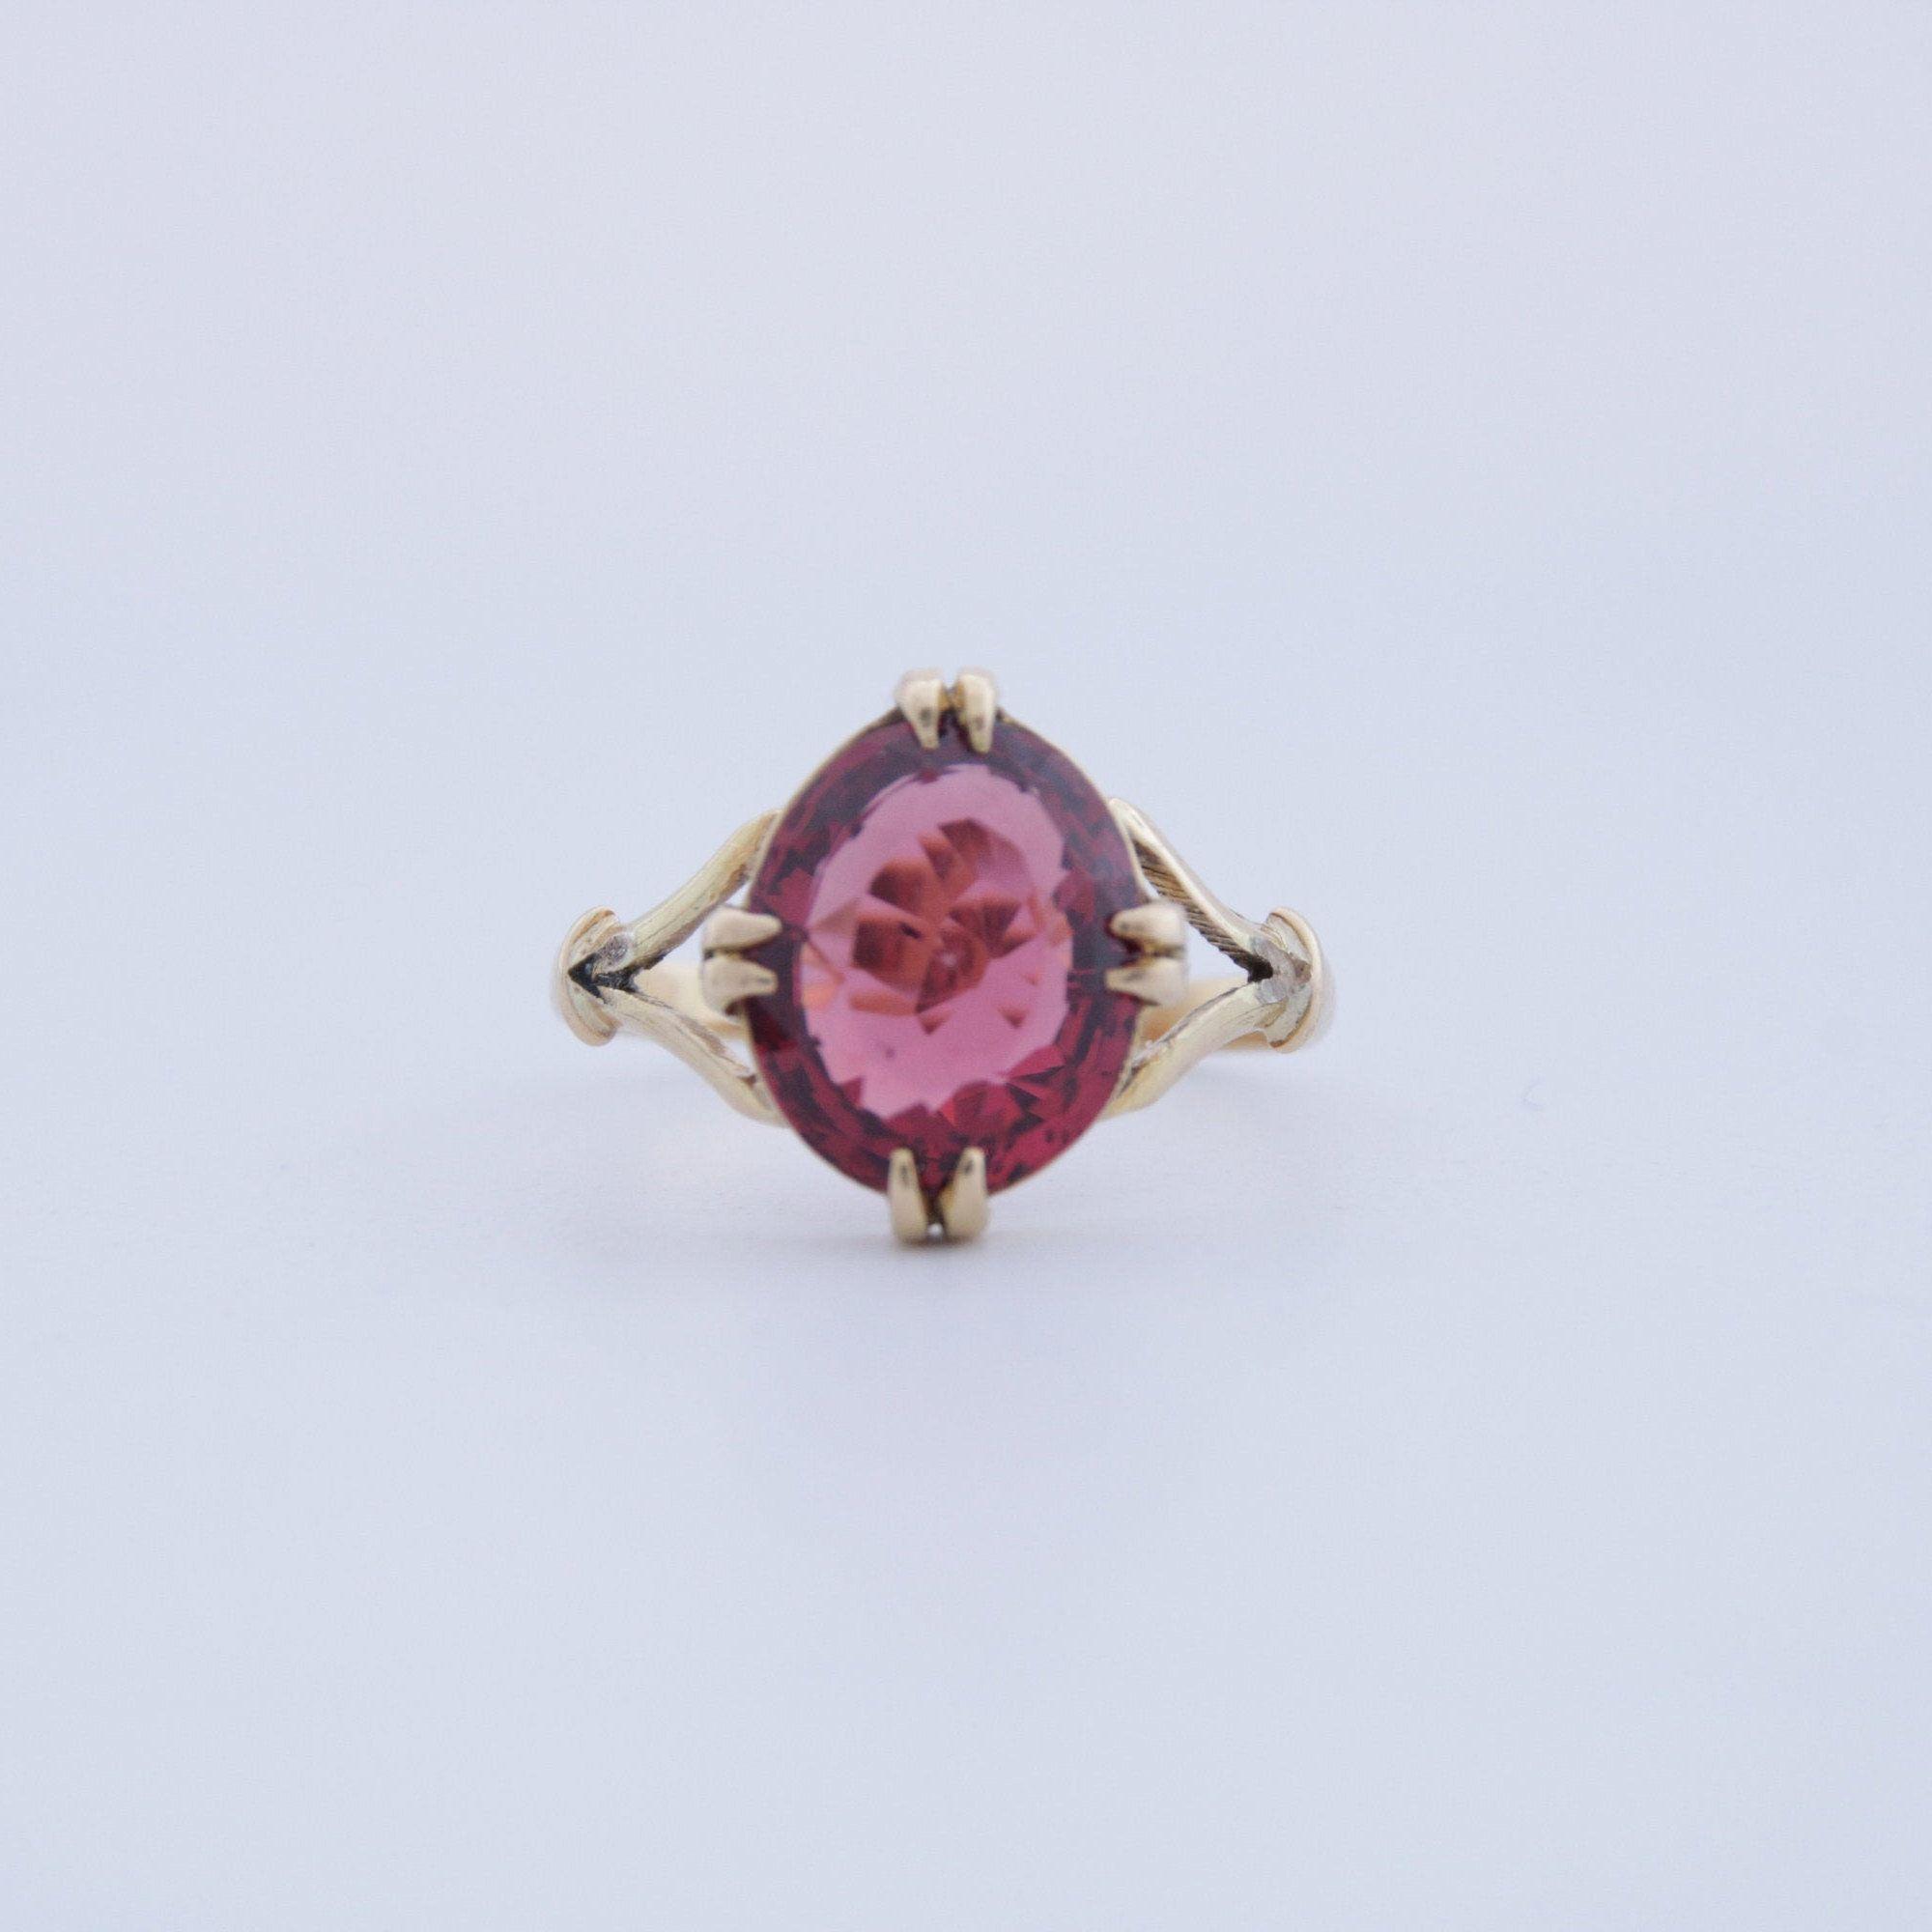 Gift For Her,V valentine gift,Mother day Gift All sizes. Natural Rhodolite Garnet 925 Sterling silver Engagement ring